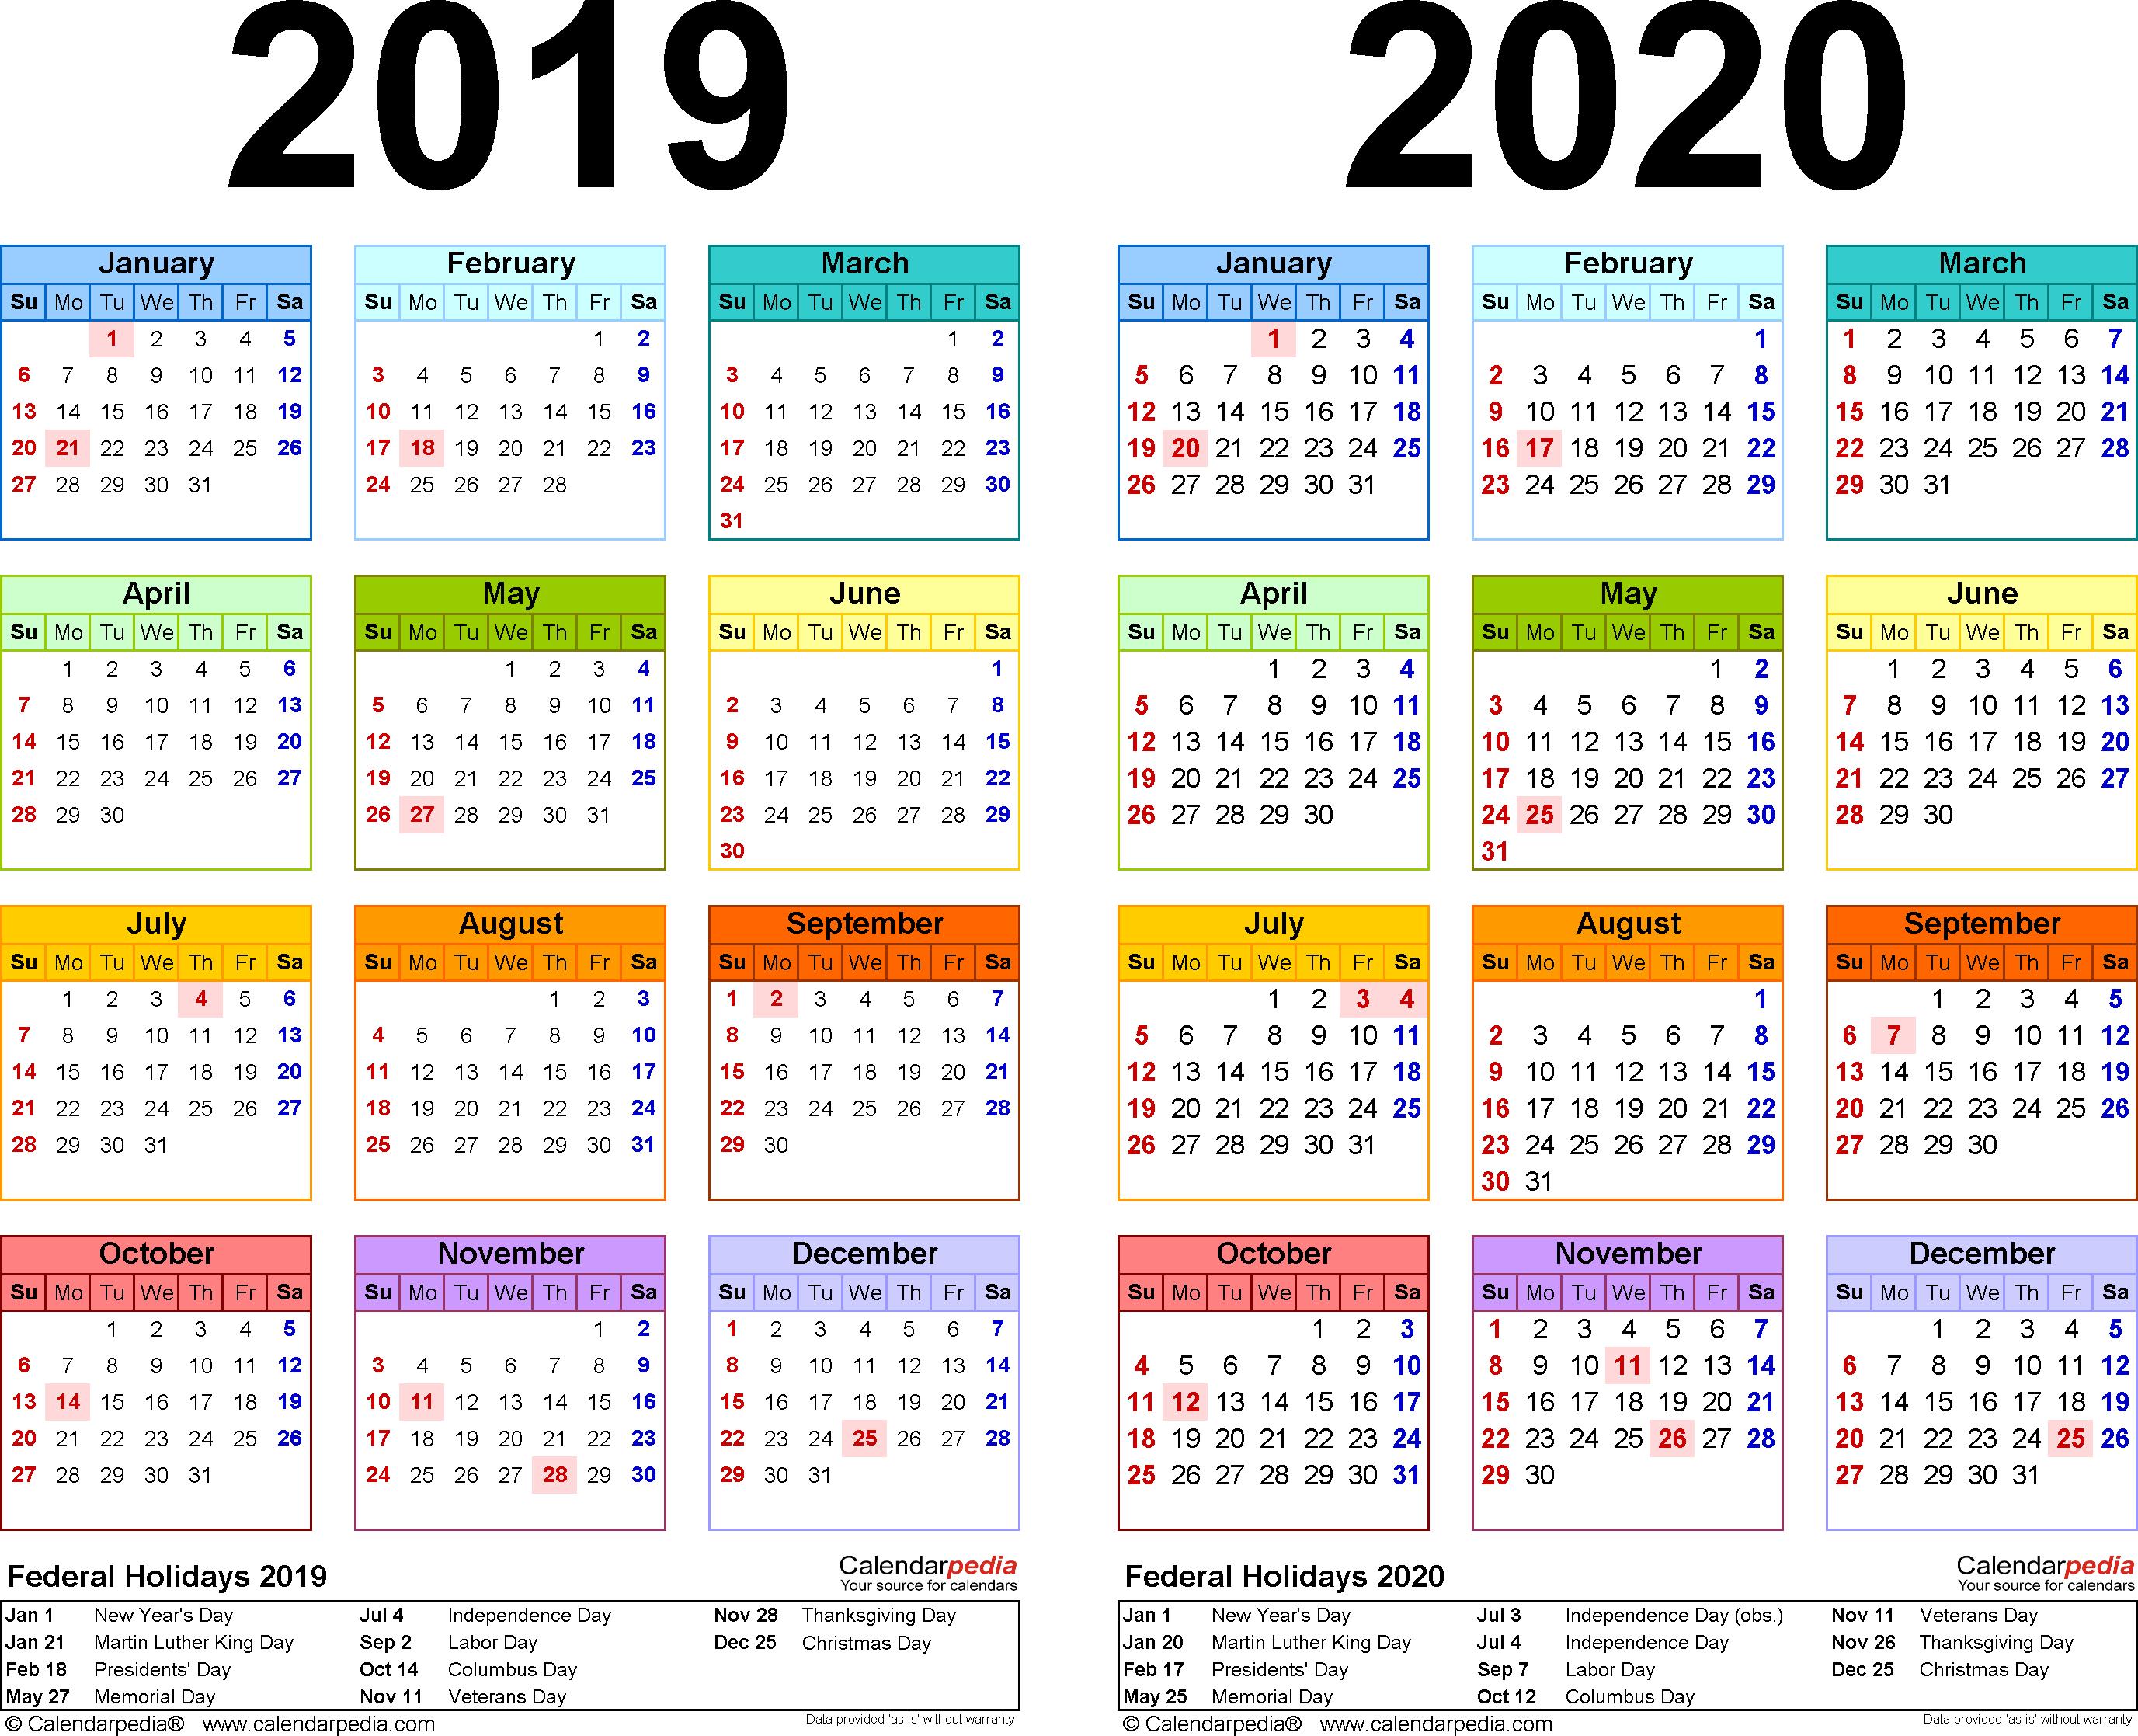 2019-2020 Calendar - Free Printable Two-Year Pdf Calendars within Free Printaabke Calendars For 2019-2020